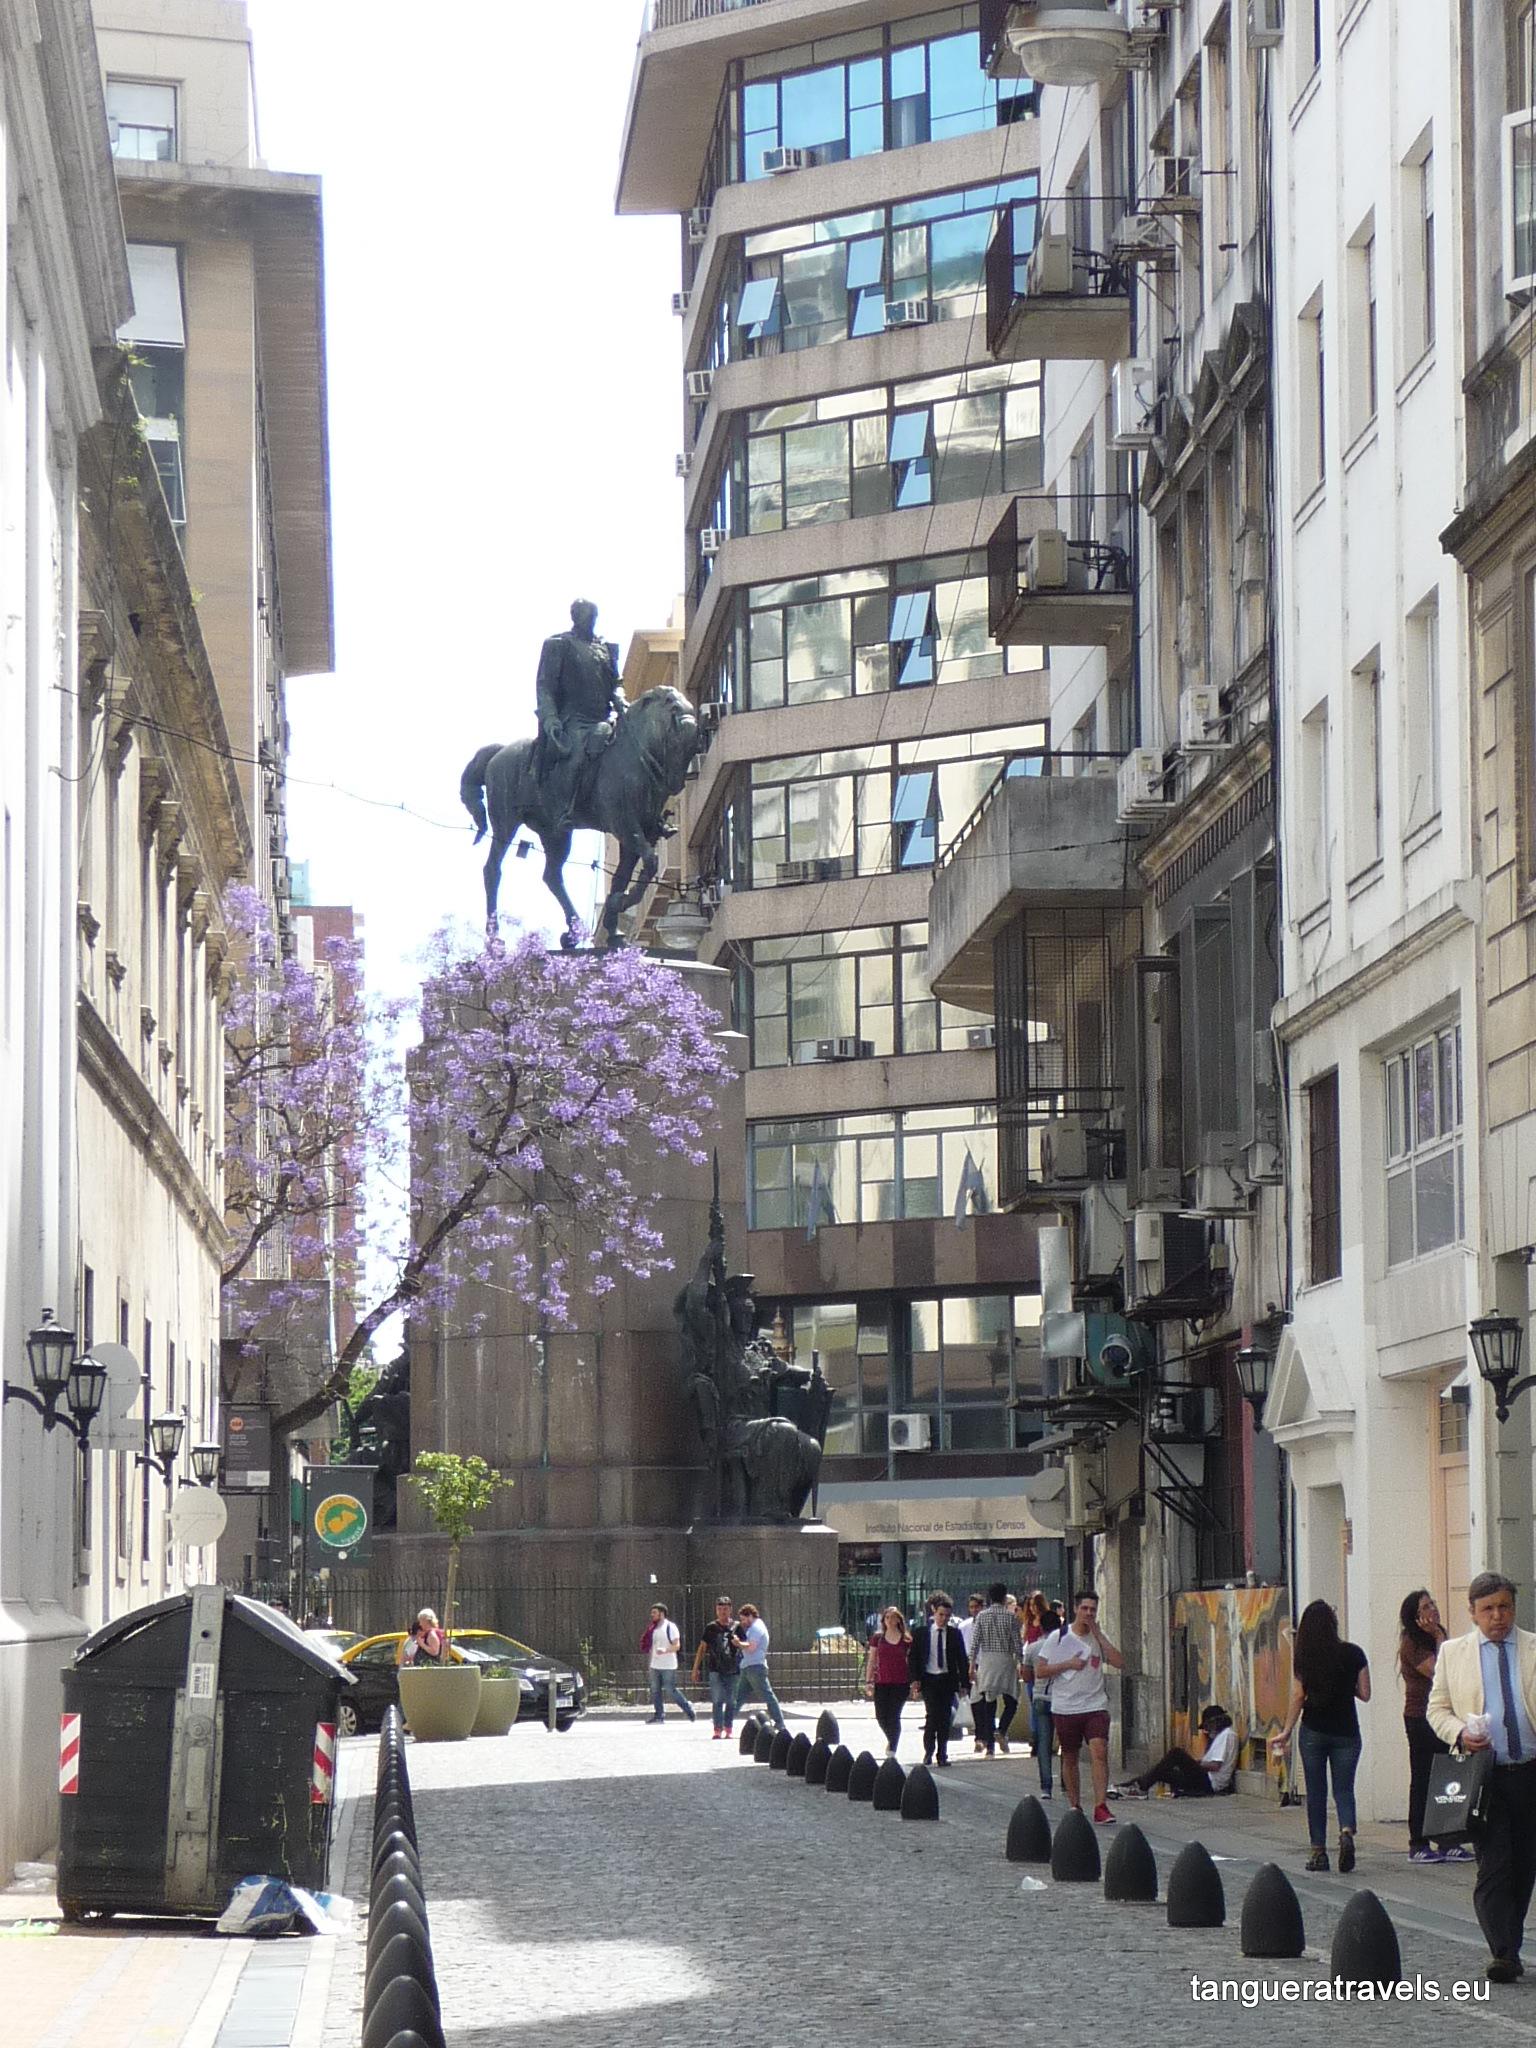 Statue carefully balances upon a tree